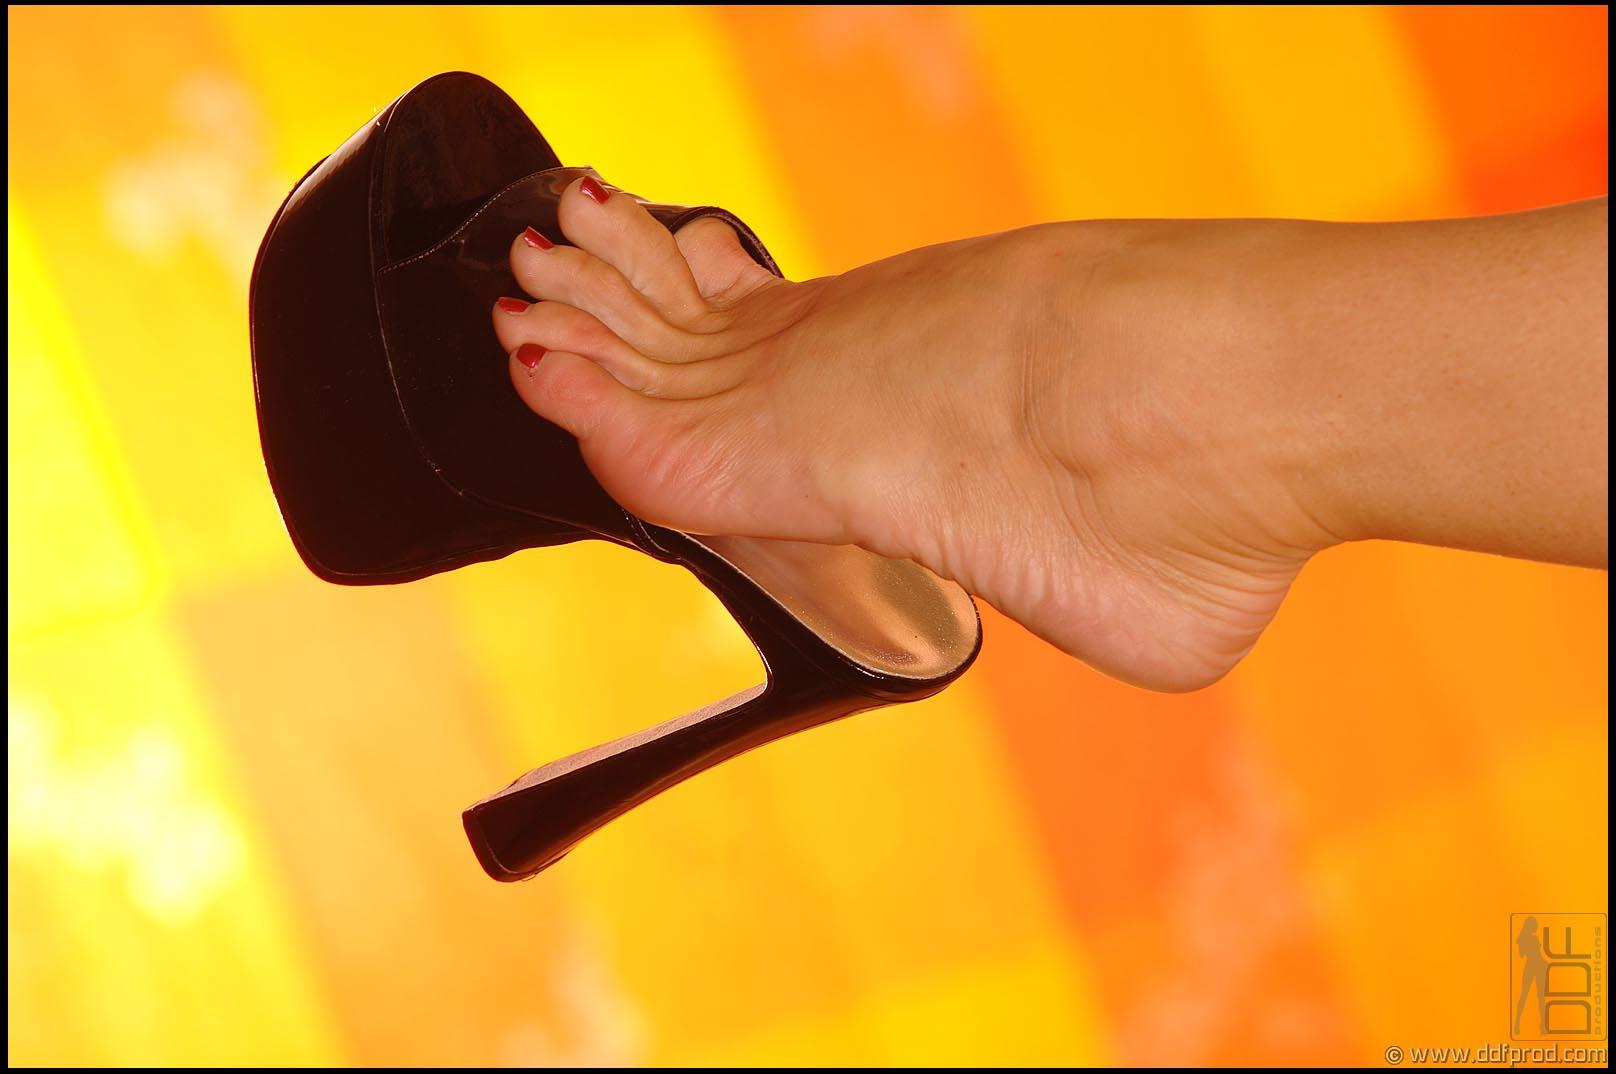 silvia saint feet